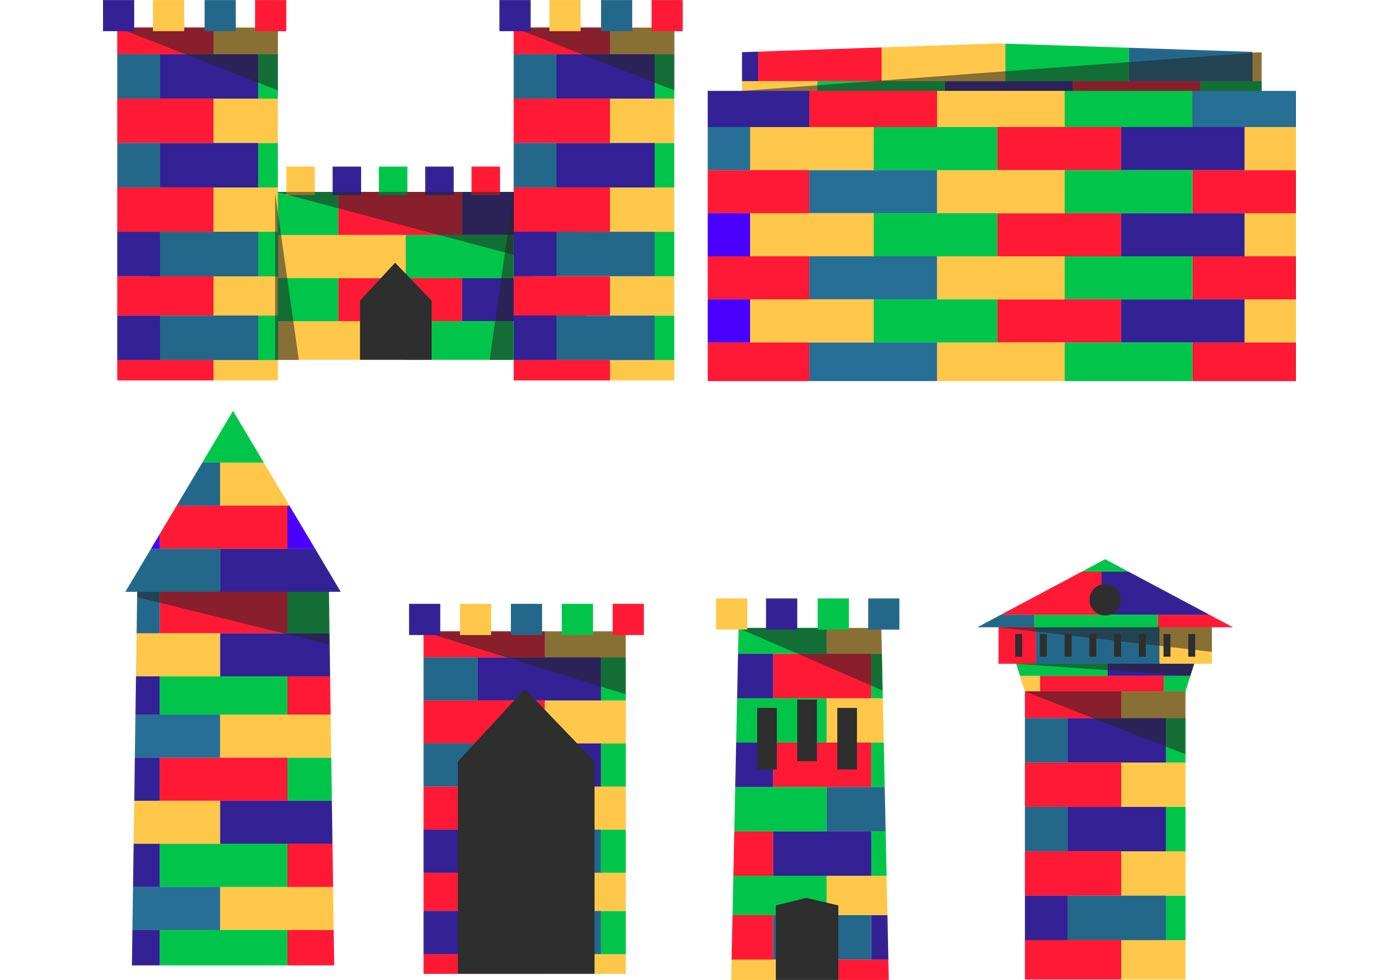 Buildable Lego Fort Vectors - Download Free Vector Art ...